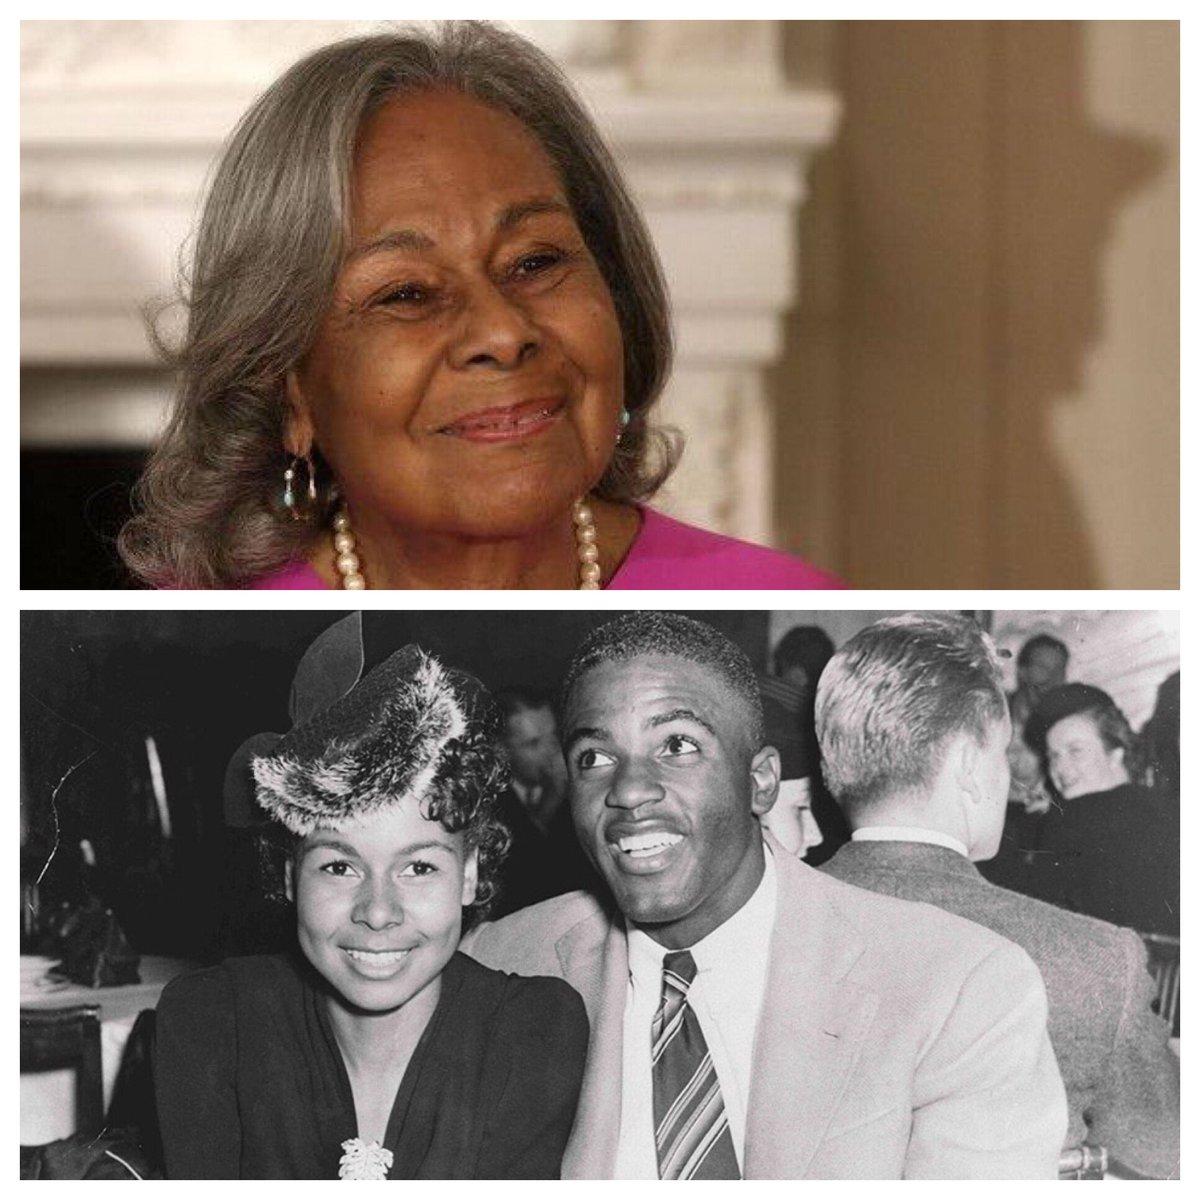 Rachel Annetta Robinson, widow of Jackie Robinson turns 97 today. Happy Birthday Mrs. Robinson, enjoy your moment! <br>http://pic.twitter.com/VJQjmBtsUw